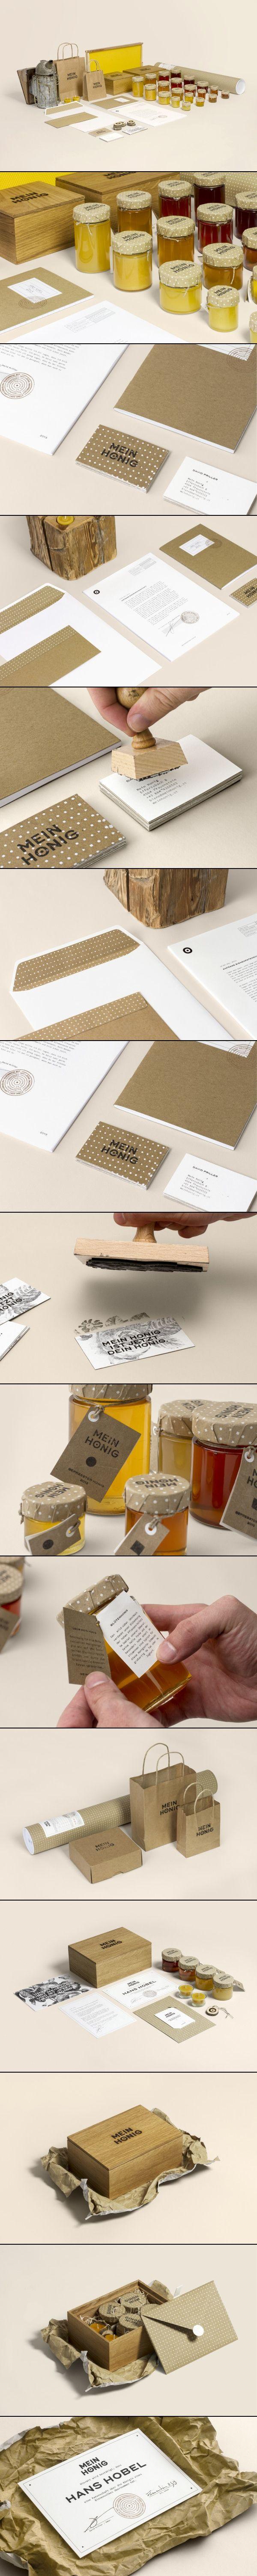 Mein Honig #identity #packaging #branding #marketing PD